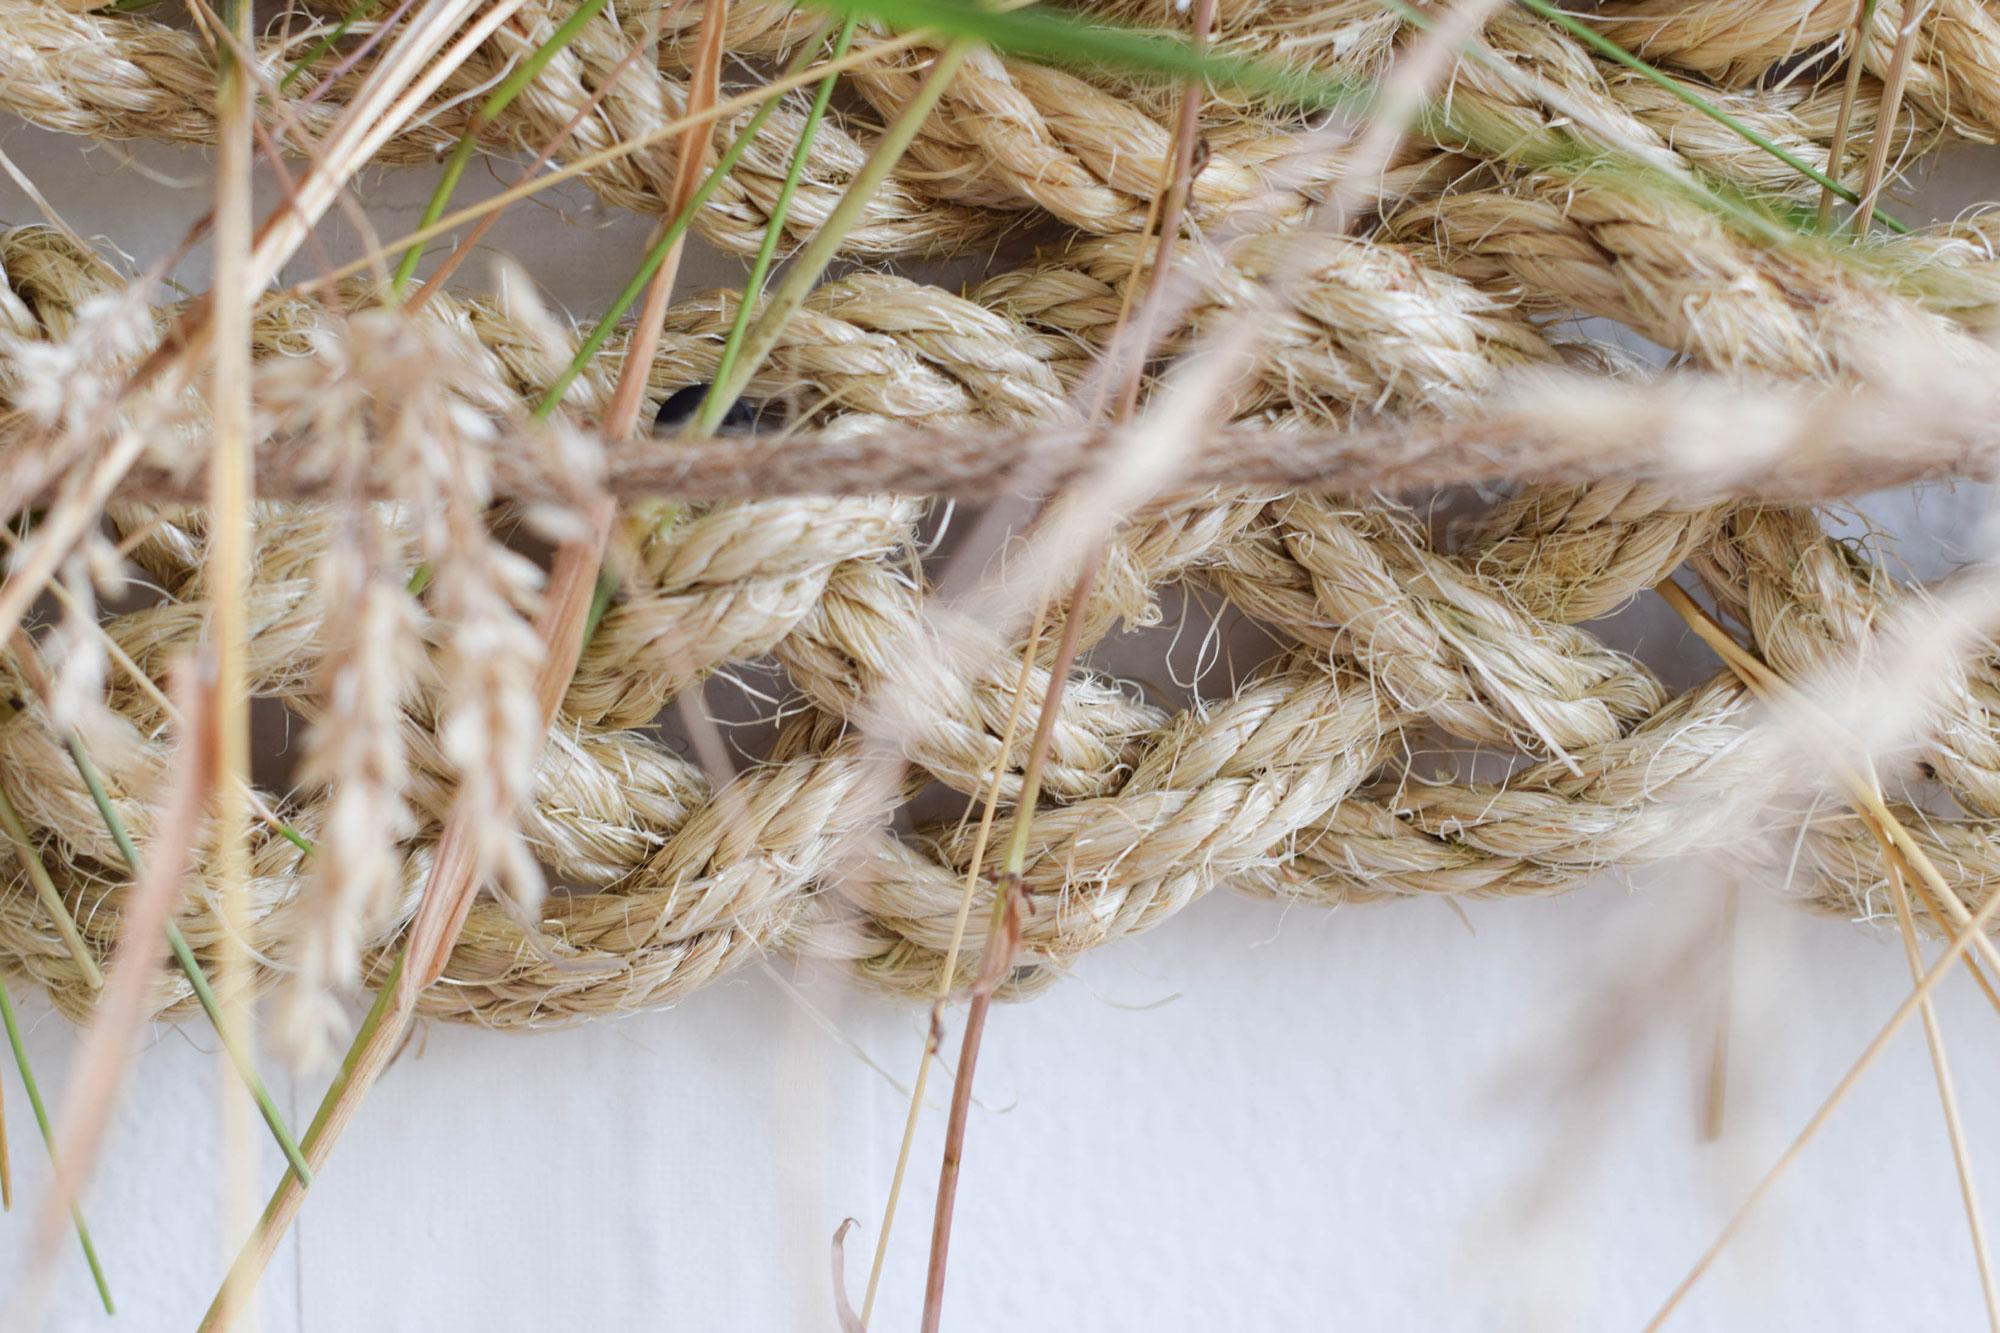 BBJ-Photoshoot--Curious-Lola---Grass-(16)